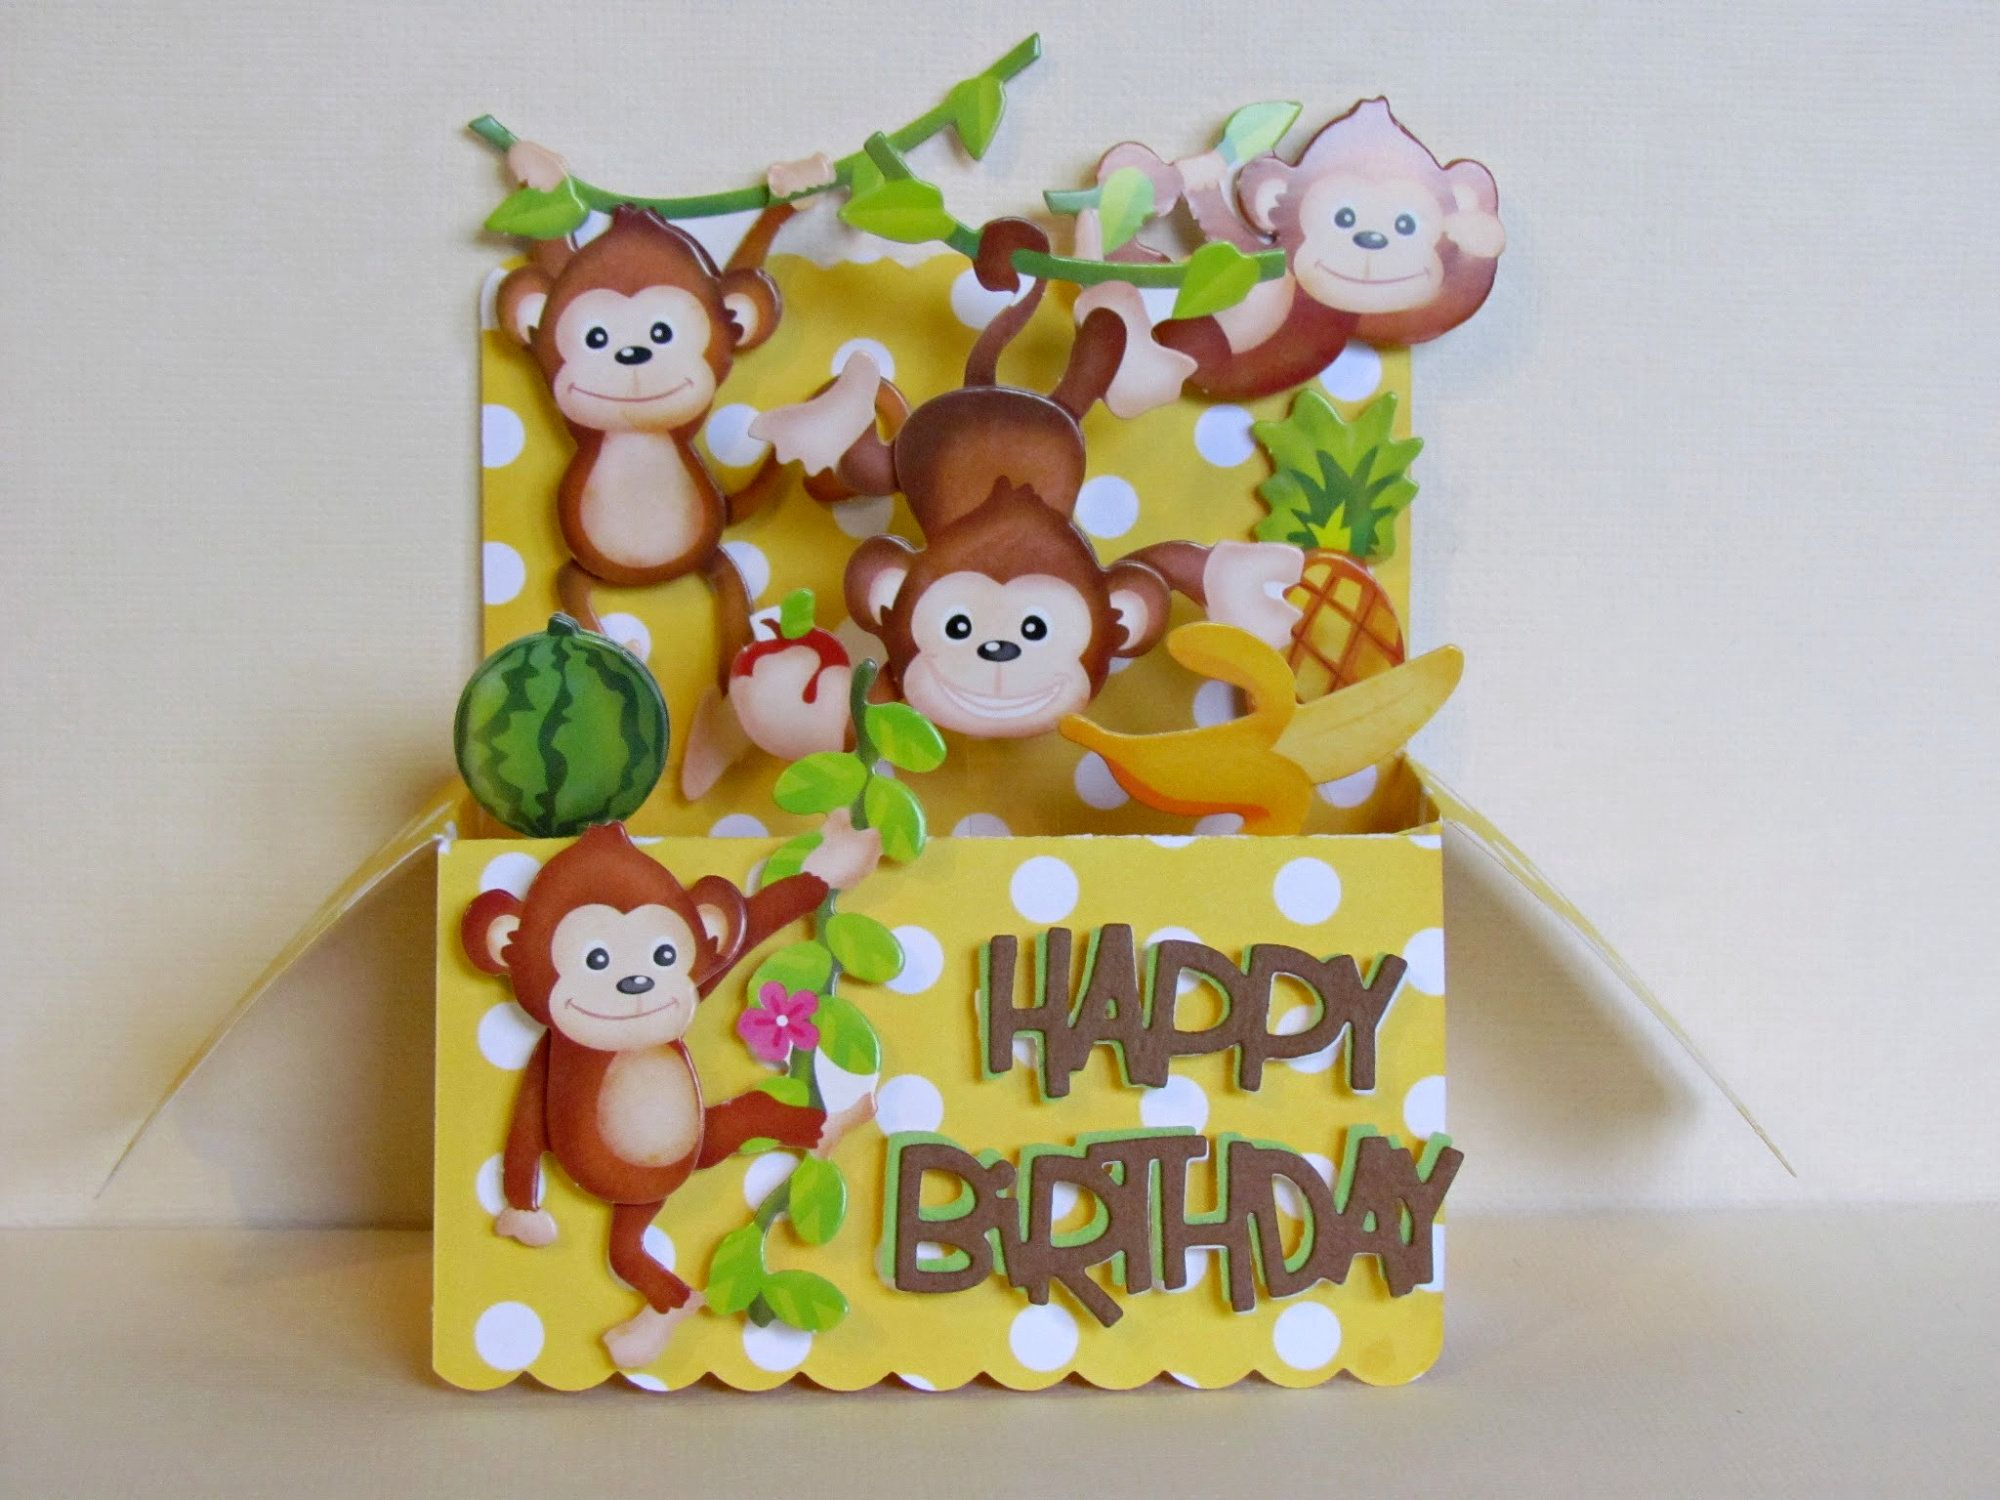 Monkey Pop Up Card Happy Birthday Card Children S Etsy Kids Birthday Cards Holiday Cards Handmade Birthday Cards